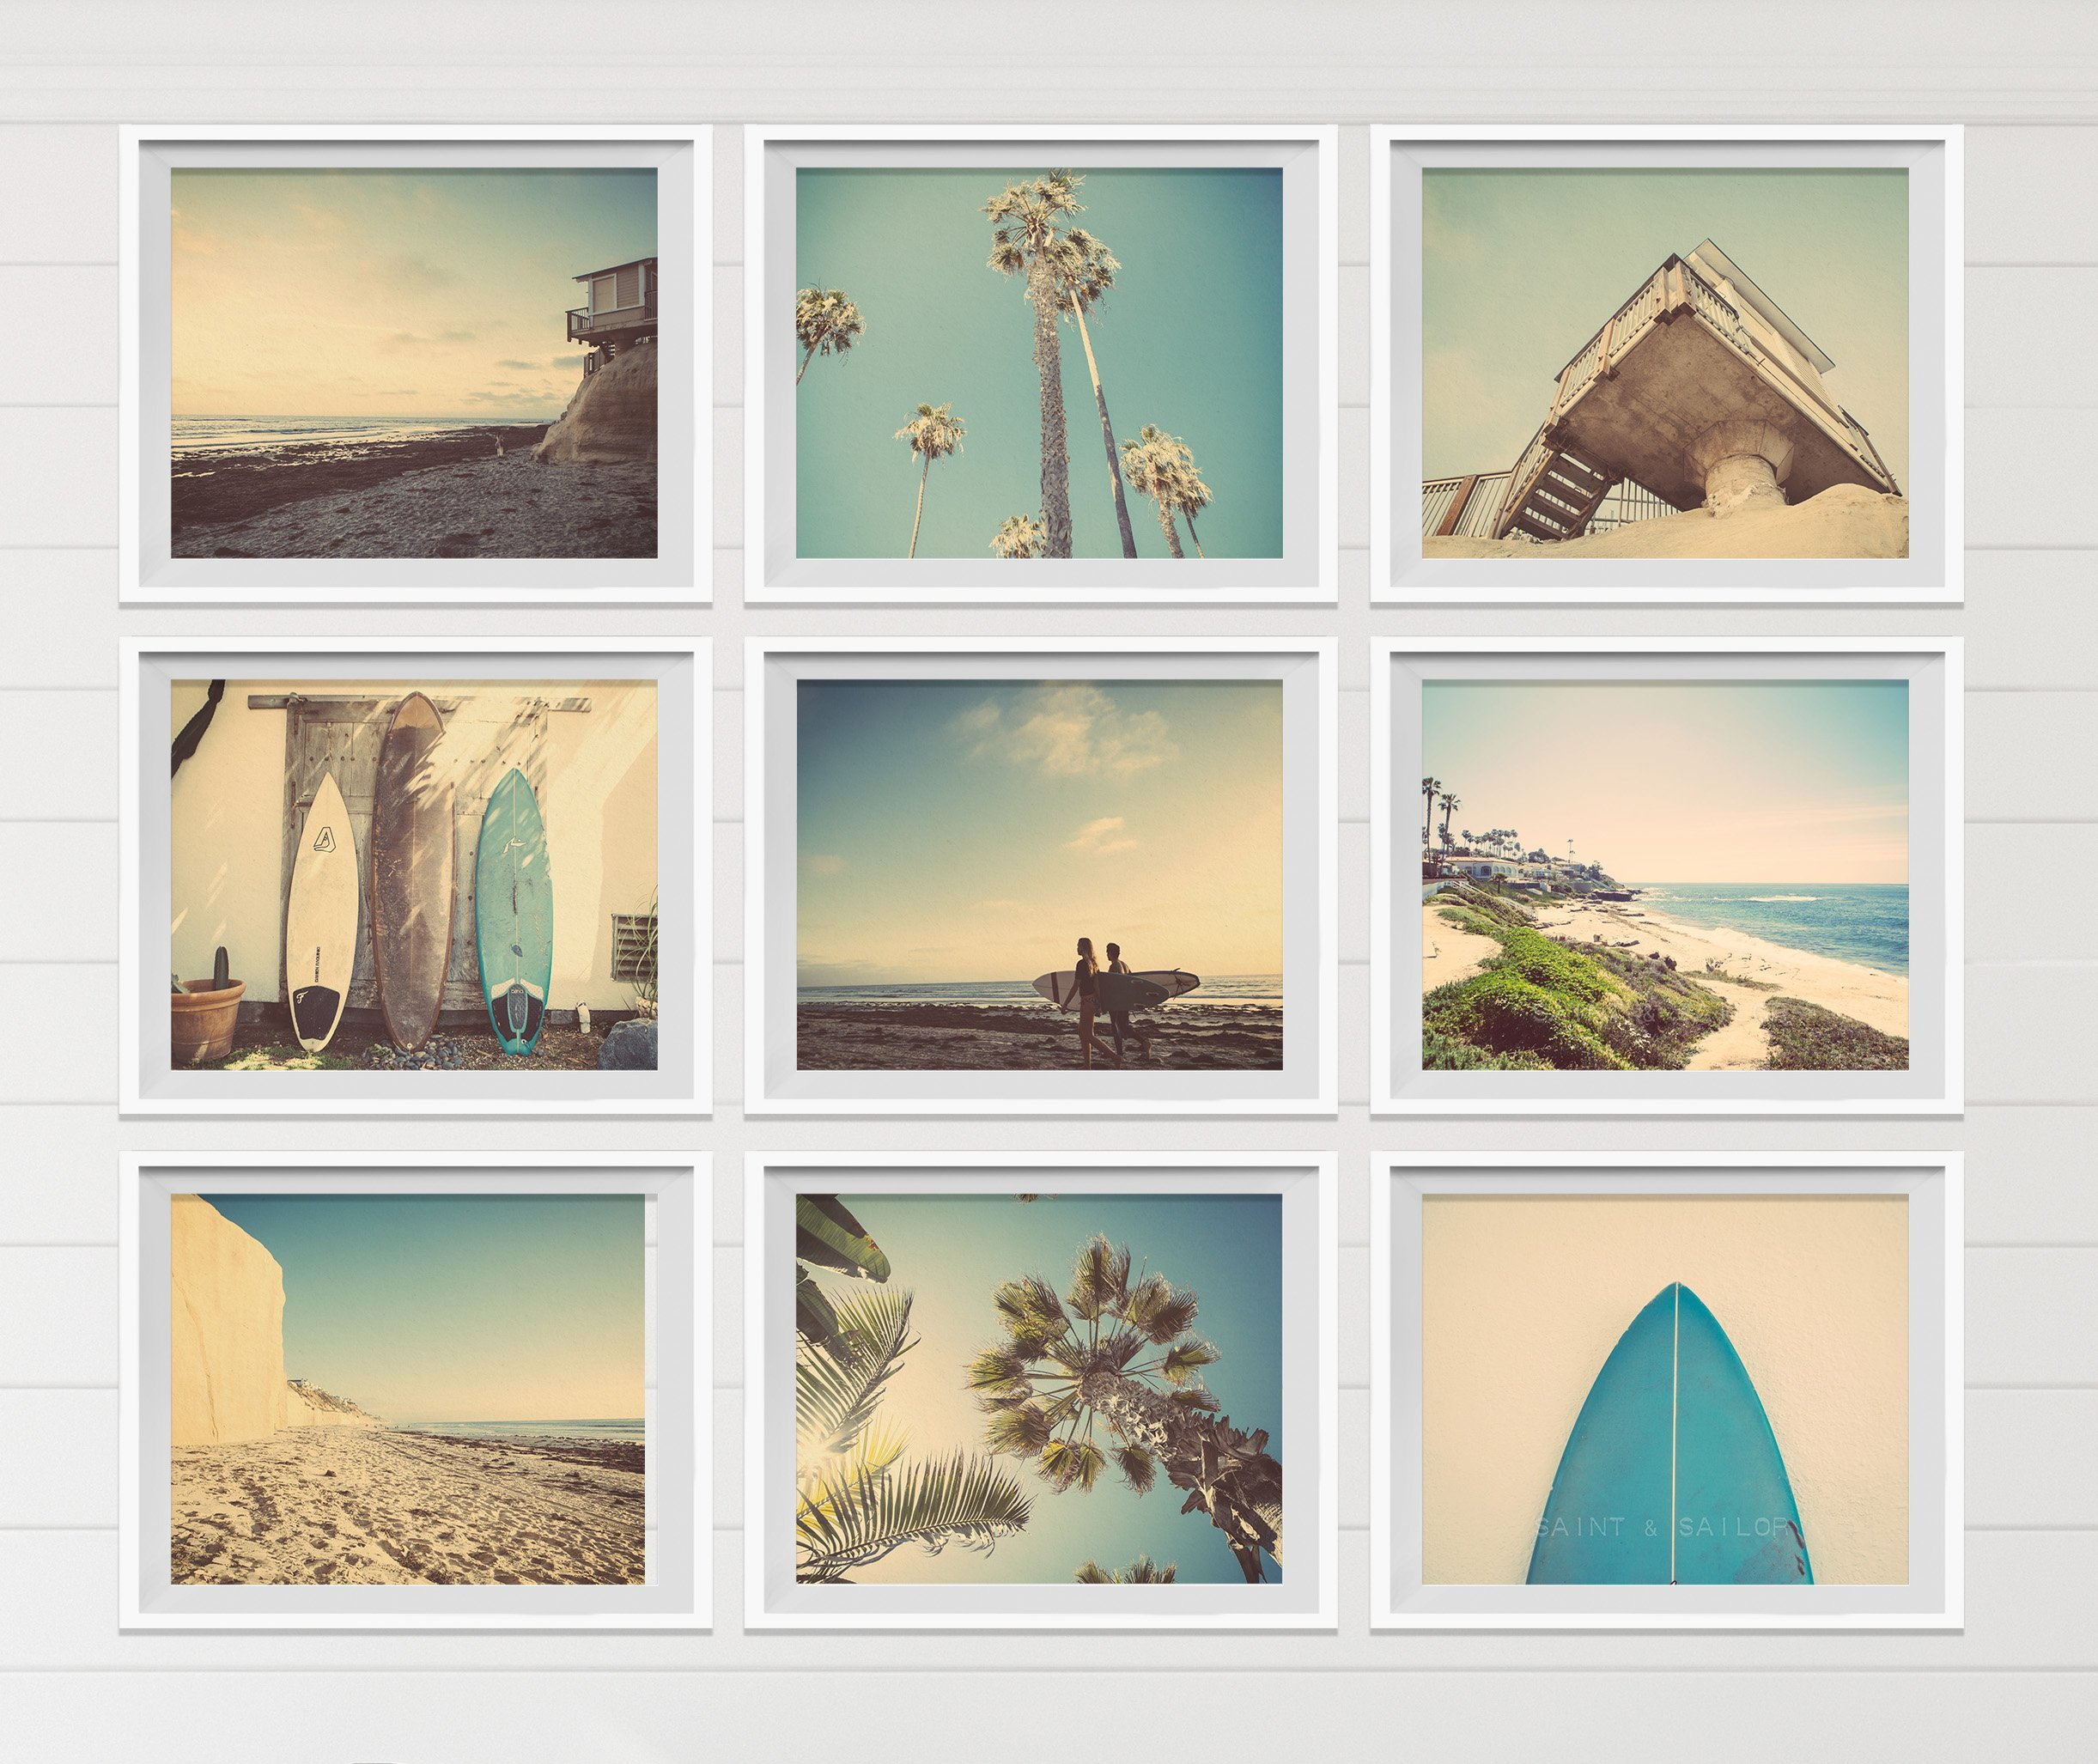 Surf Beach Themed Fine Art Photography Set of 9 on Photo Paper Prints, beach photos, , yellow, turquoise, sunset, retro, vintage surf home decor, beach wall art